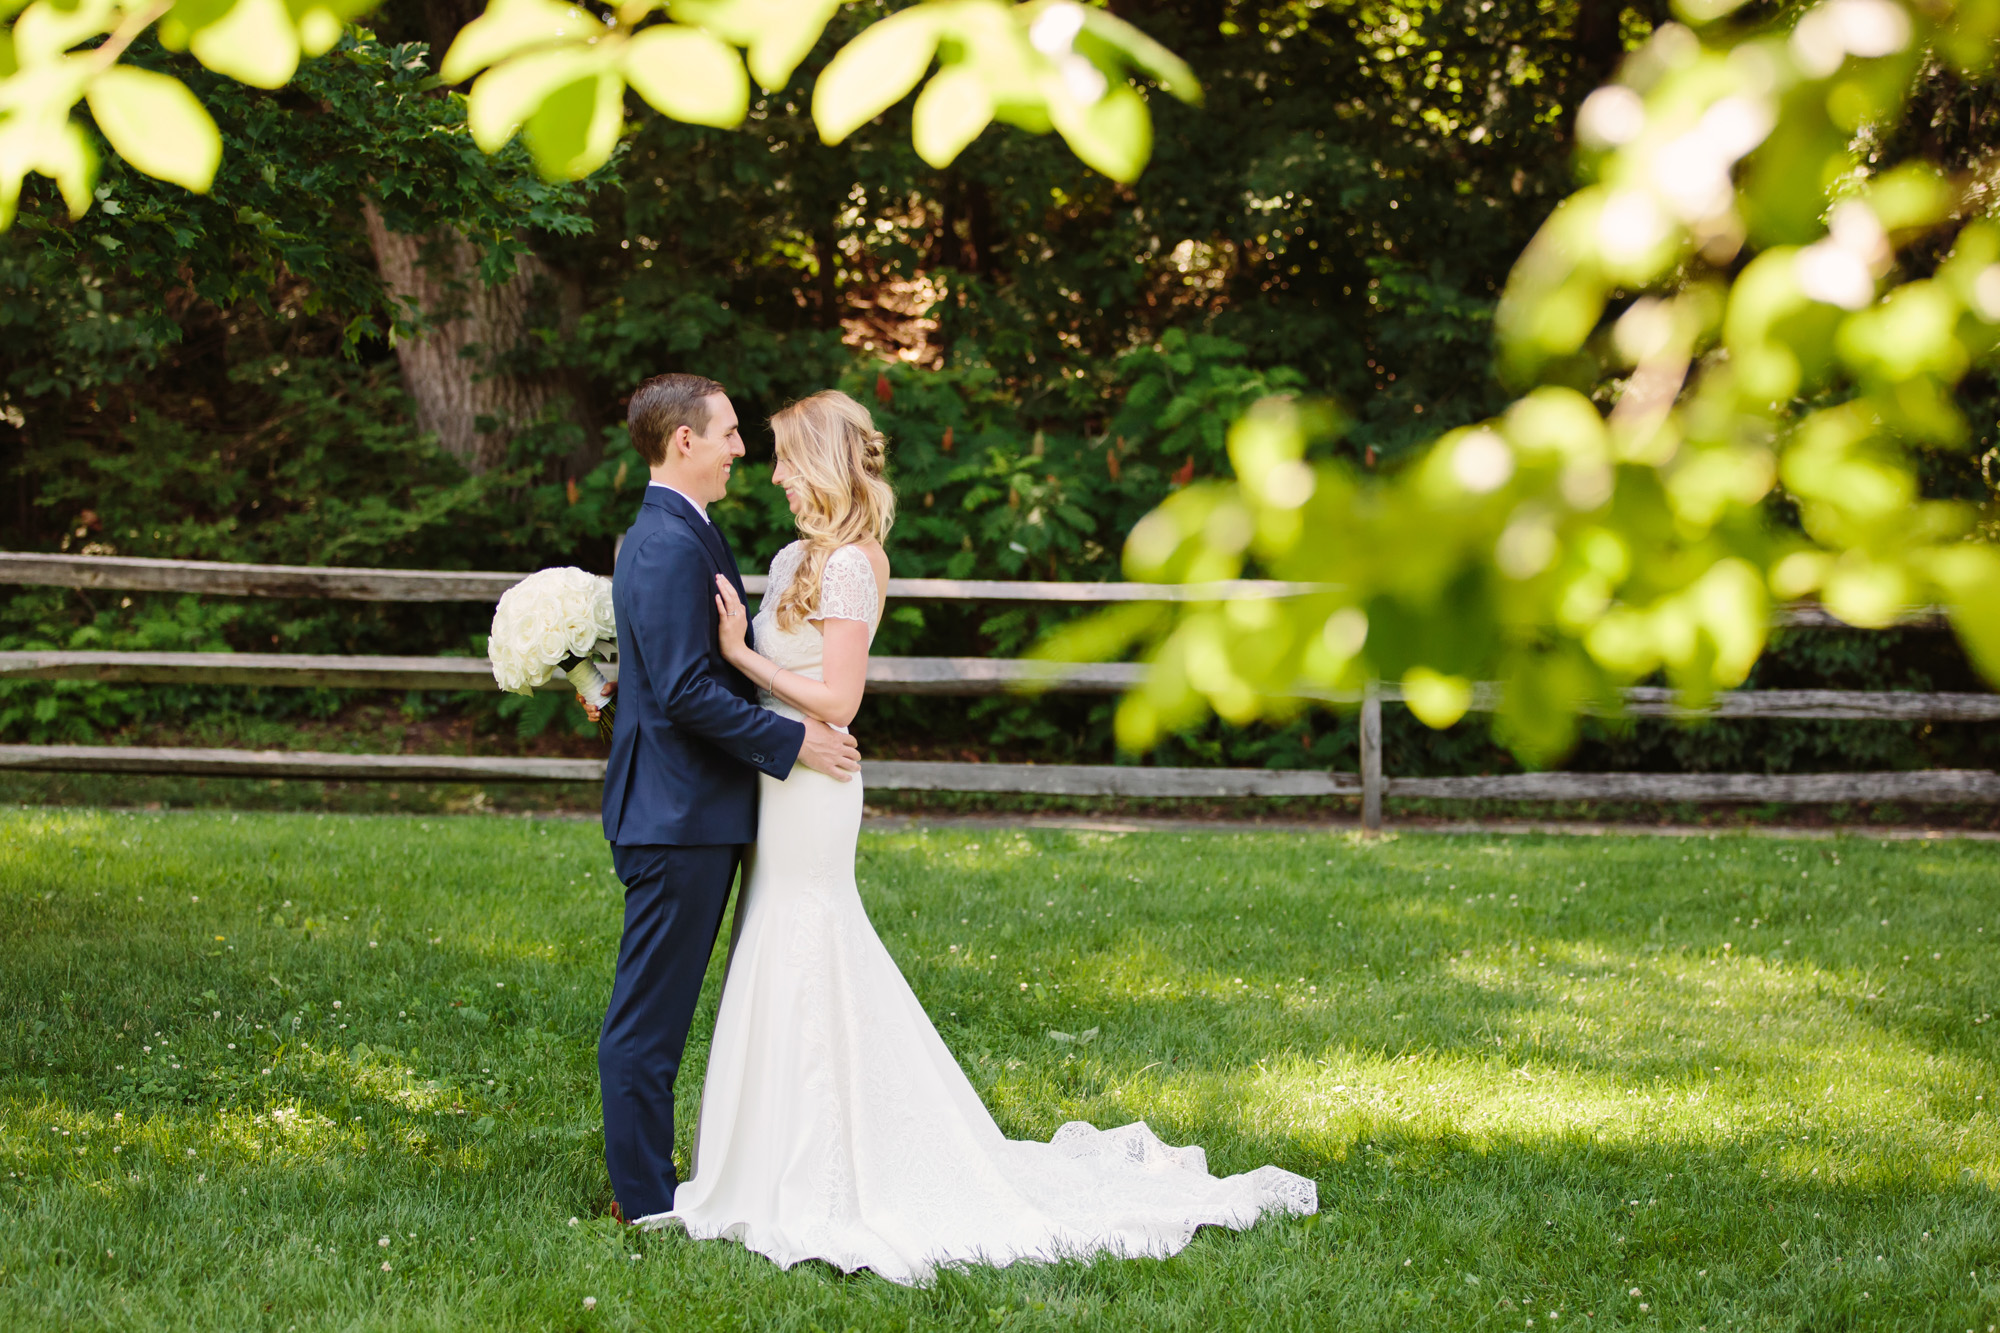 01_Jessica_Ted_Blue_Hill_Stone_Barns_Wedding_Pocantico_NY_Tanya_Salazar_Photography_034.jpg